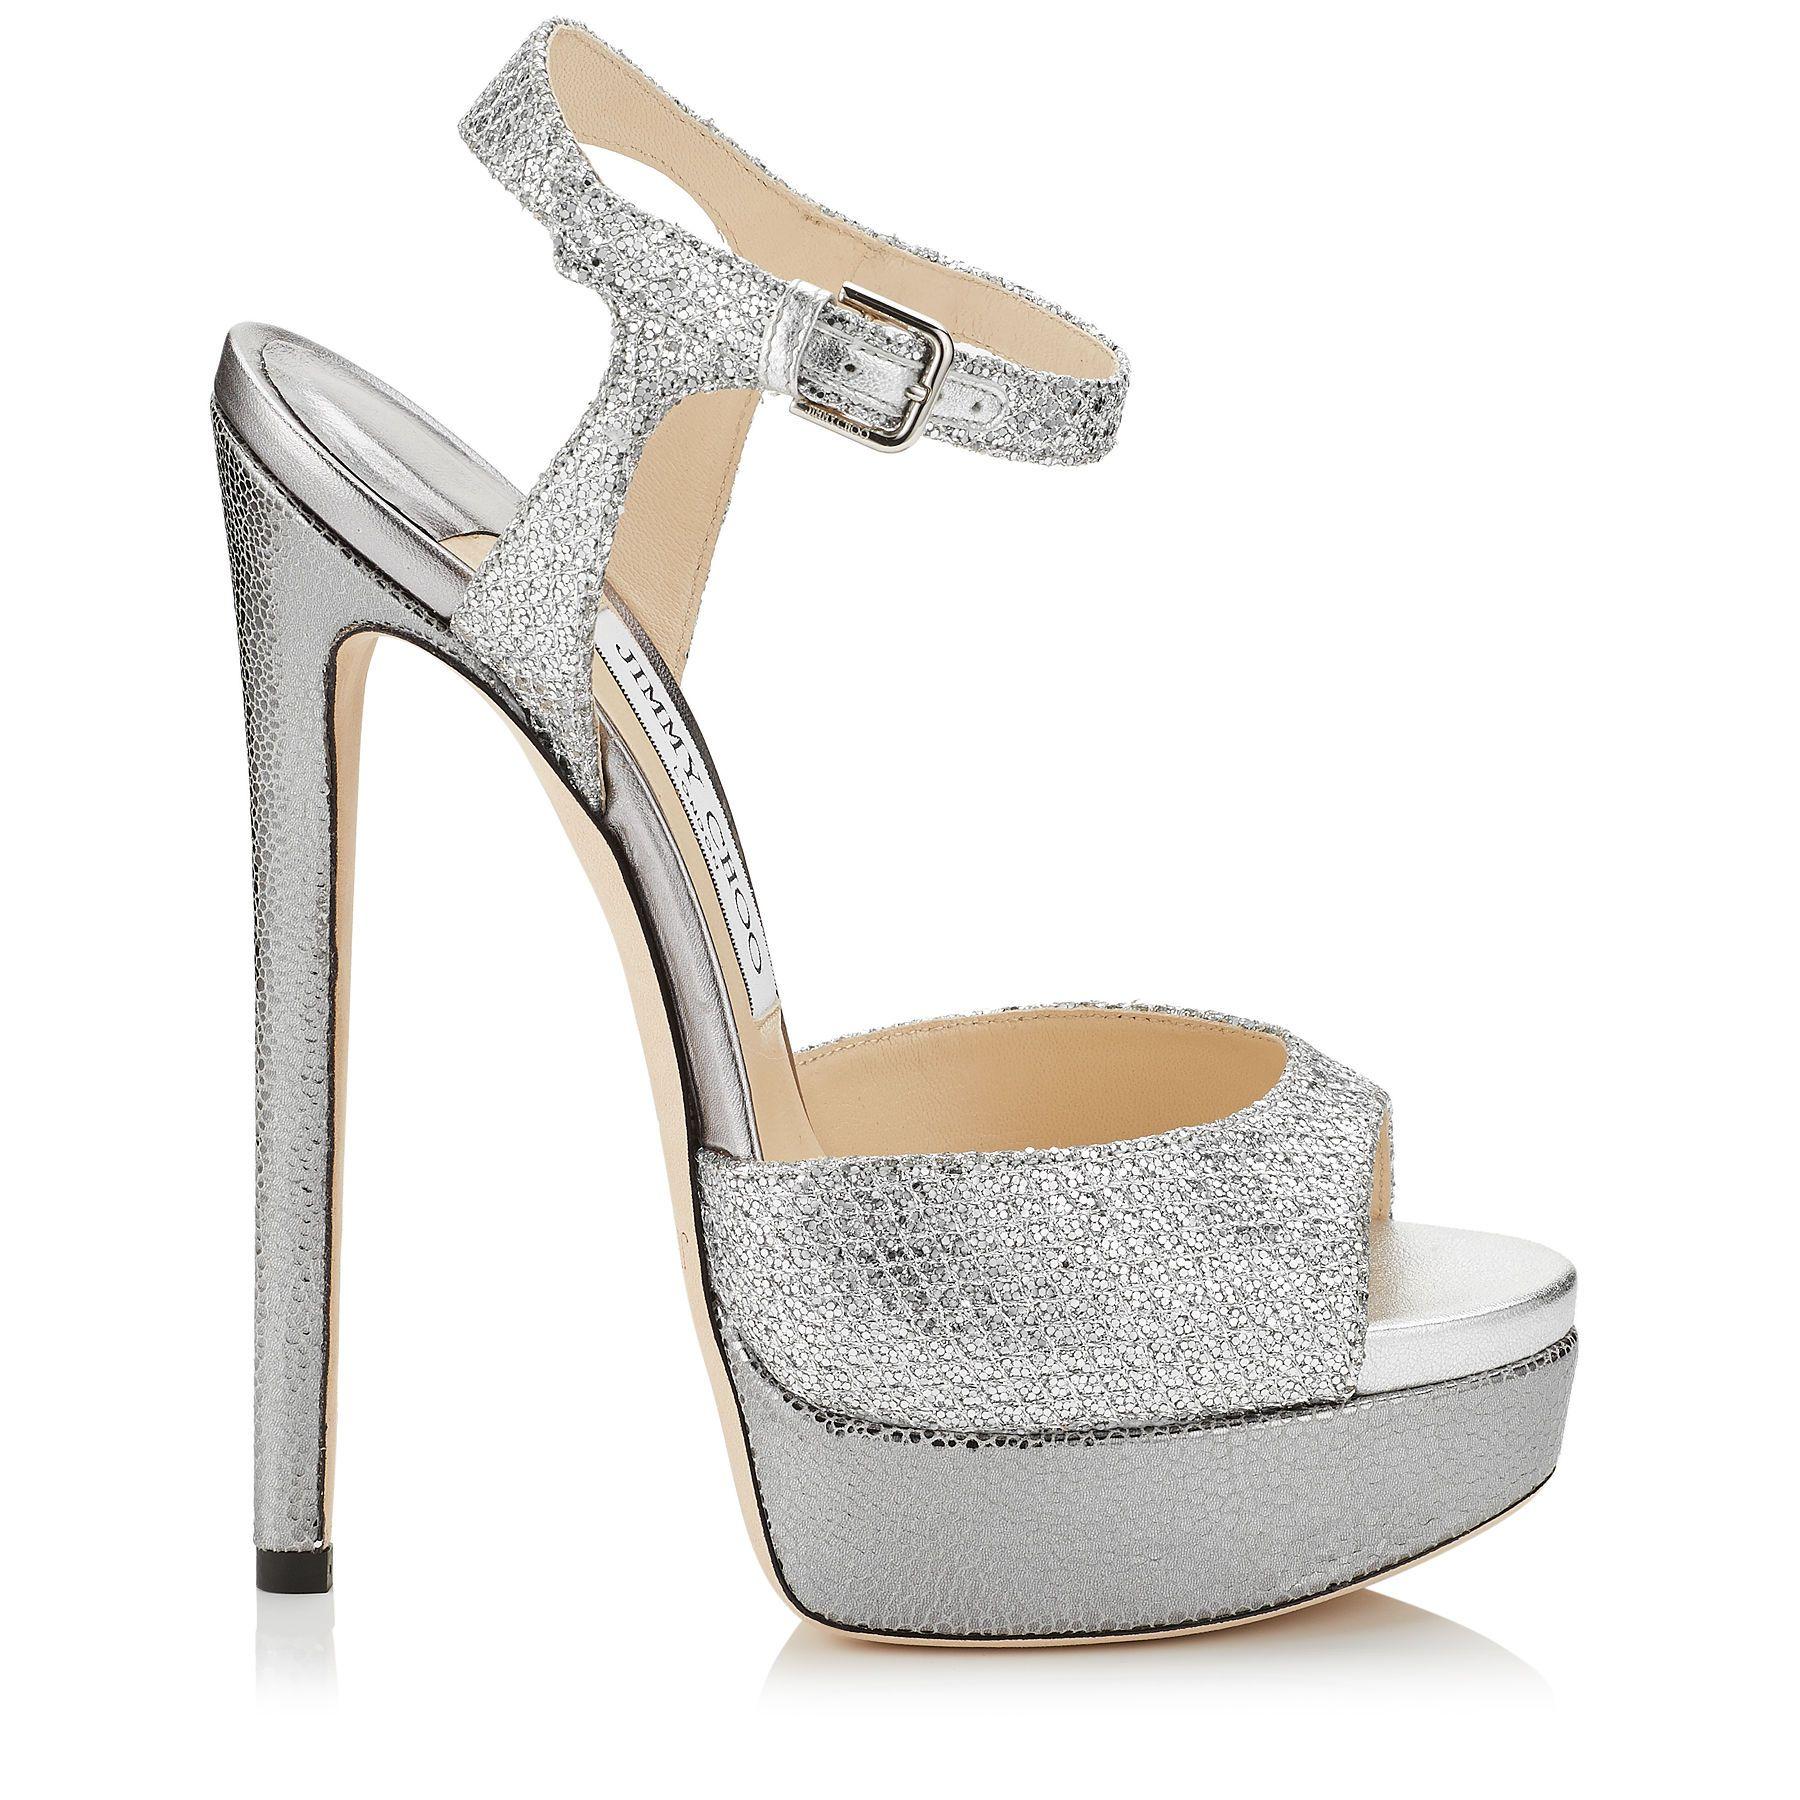 Jenna 150 Platform Sandals in Silver Glitter Fabric.